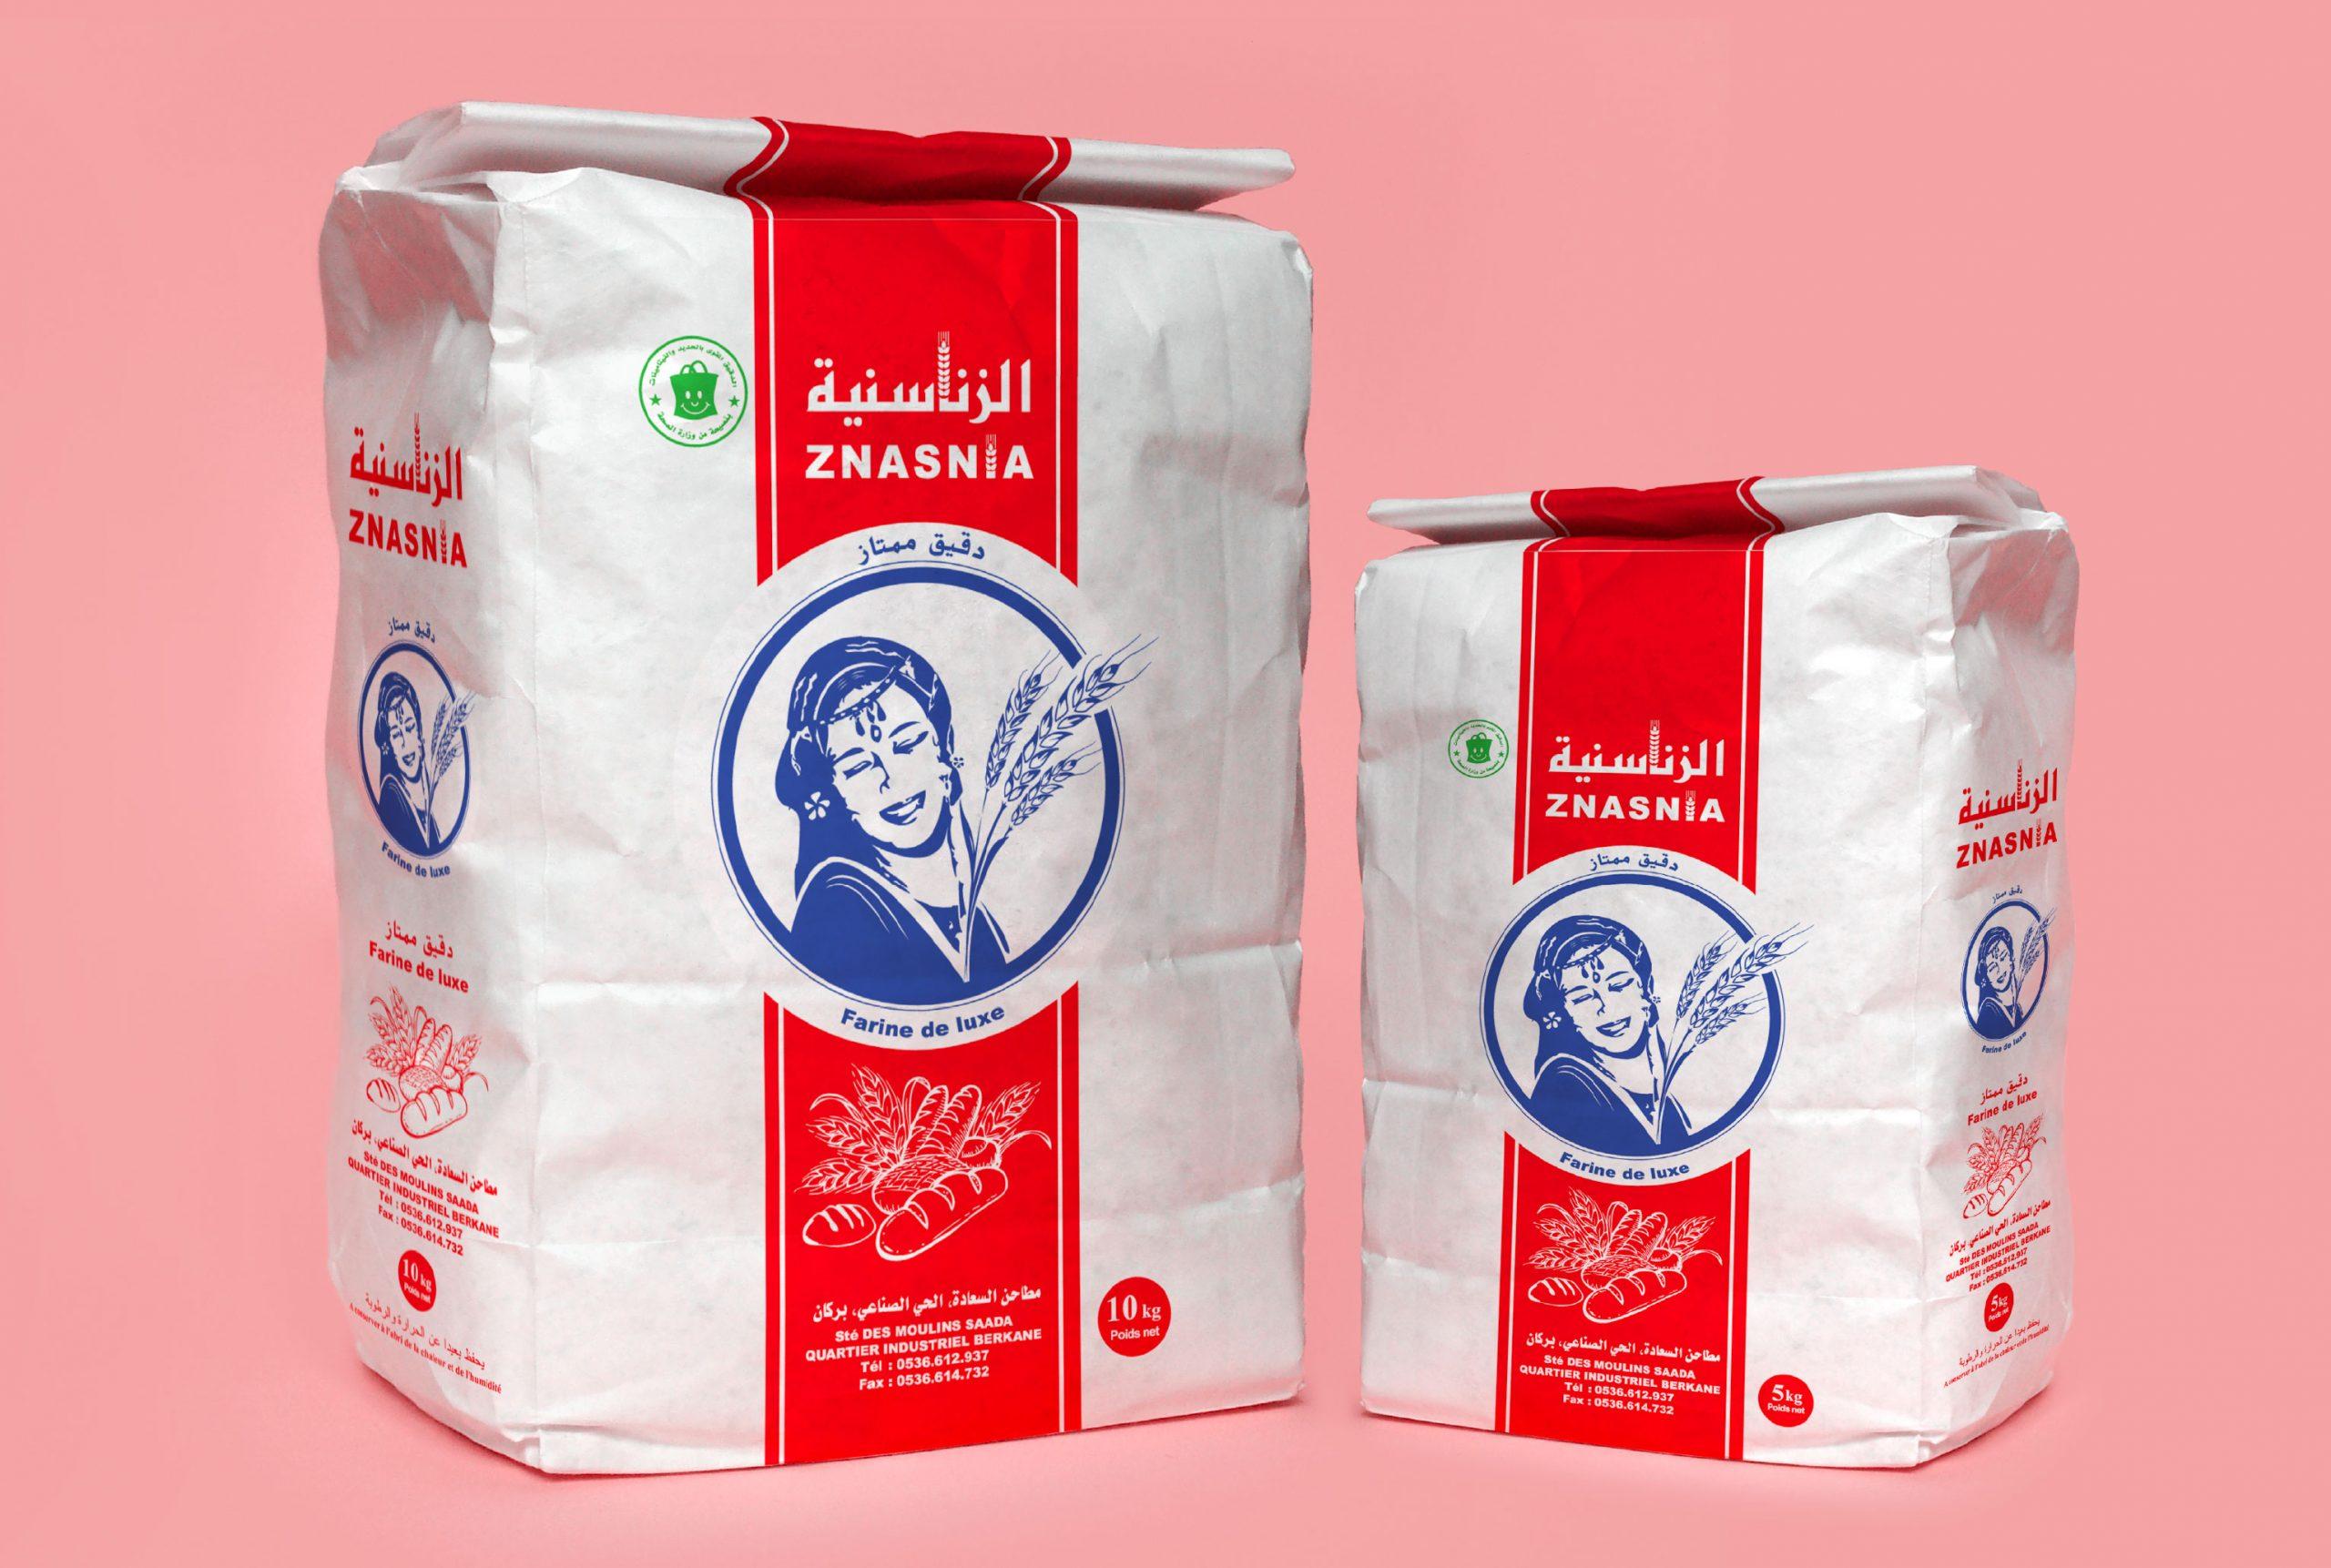 znasia packaging